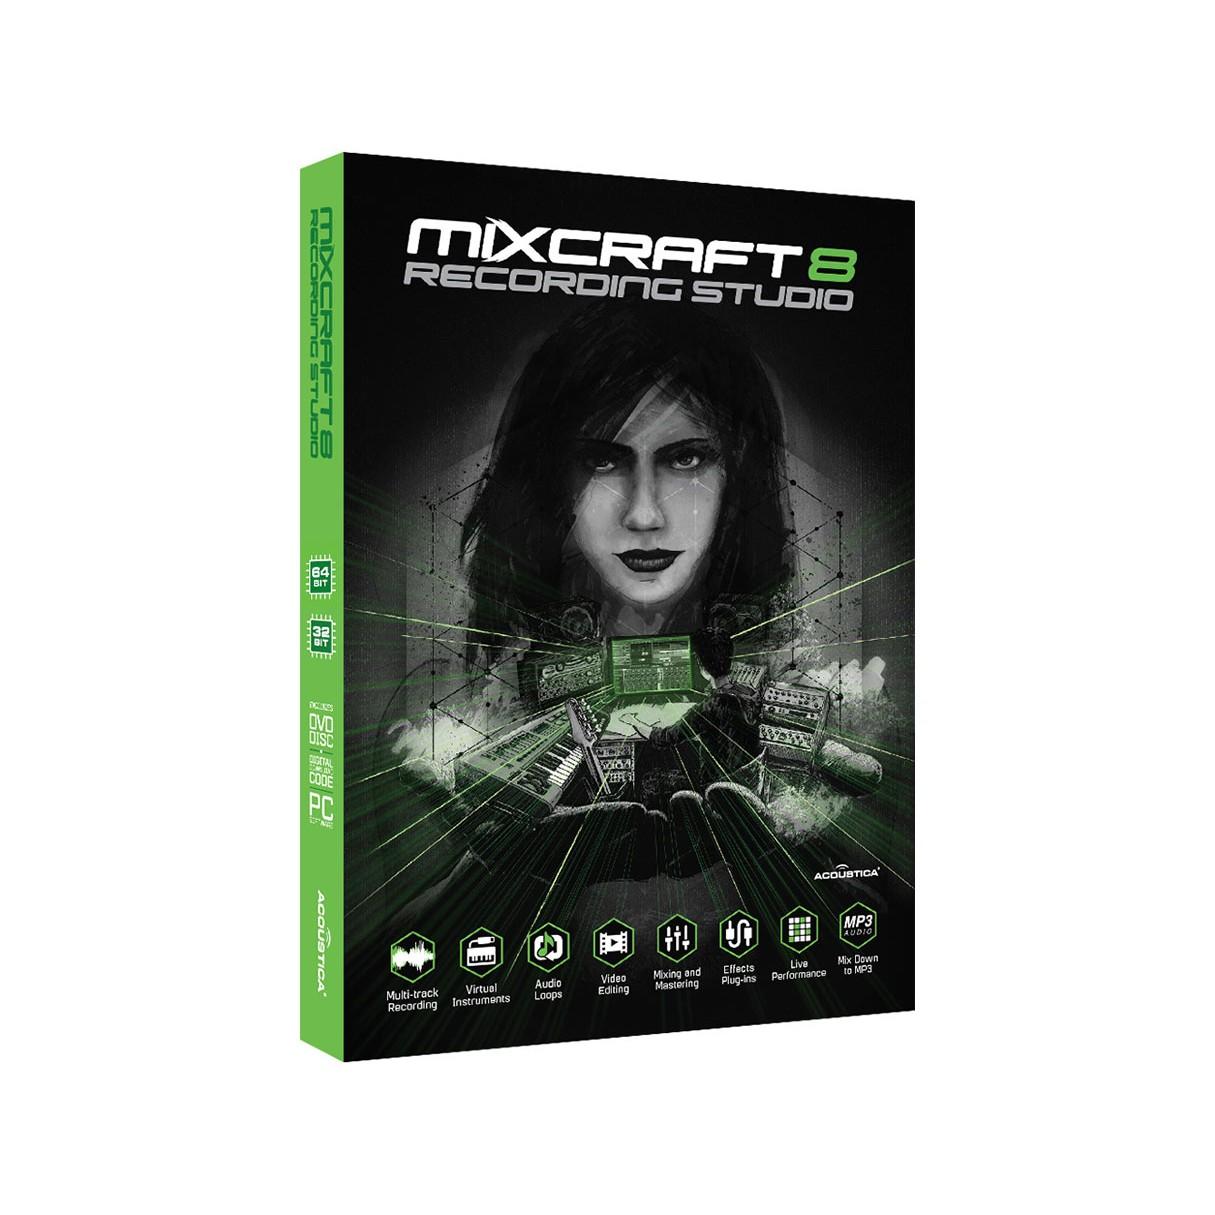 Acoustica Mixcraft 8 Record Studio Windows Music Production Software